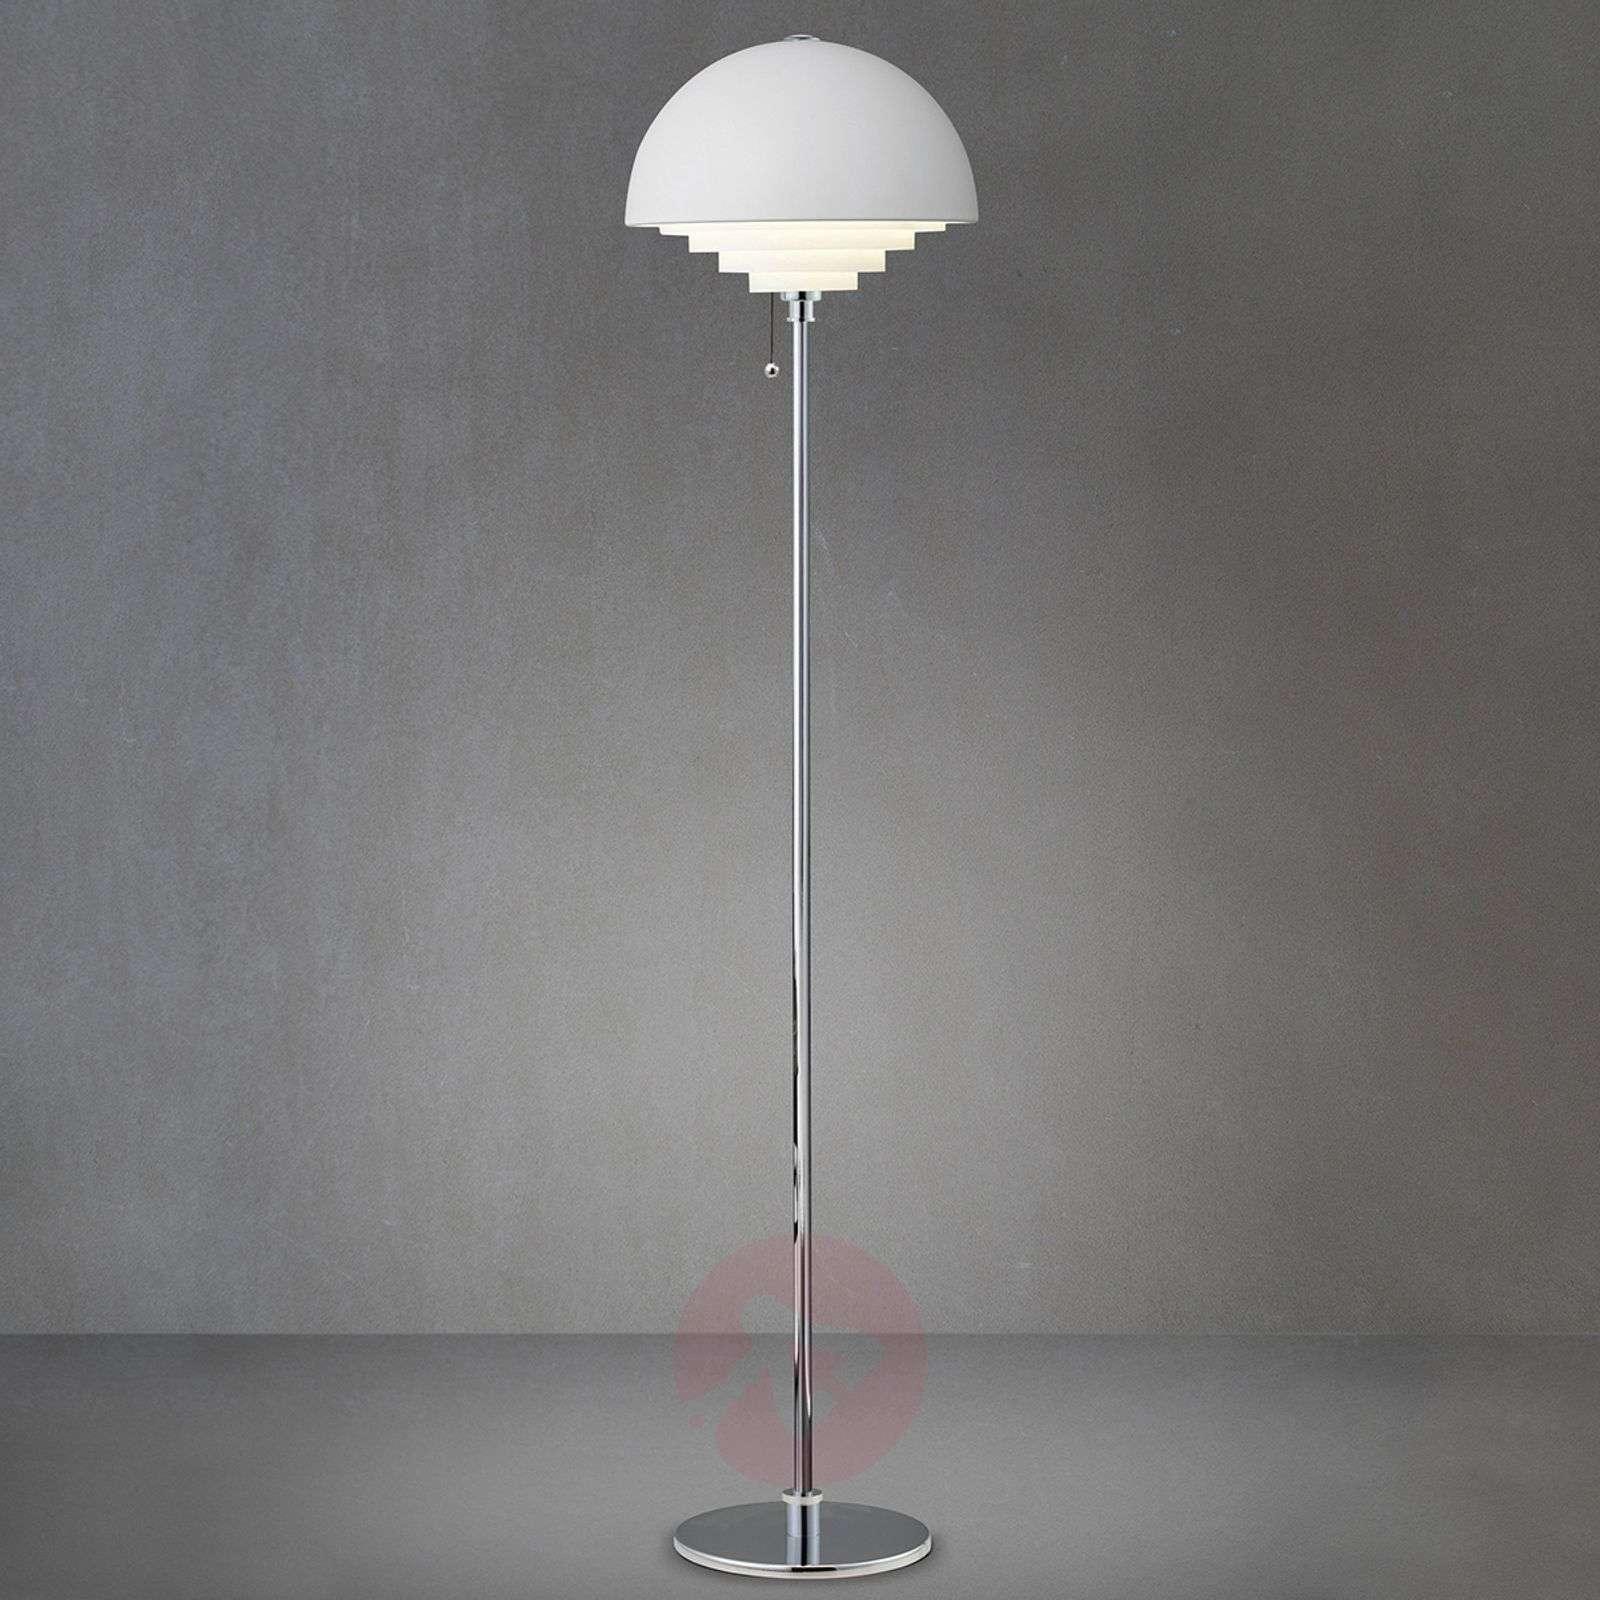 lamp oakleigh furniture oh best ashley floor store product dealer mentor metal